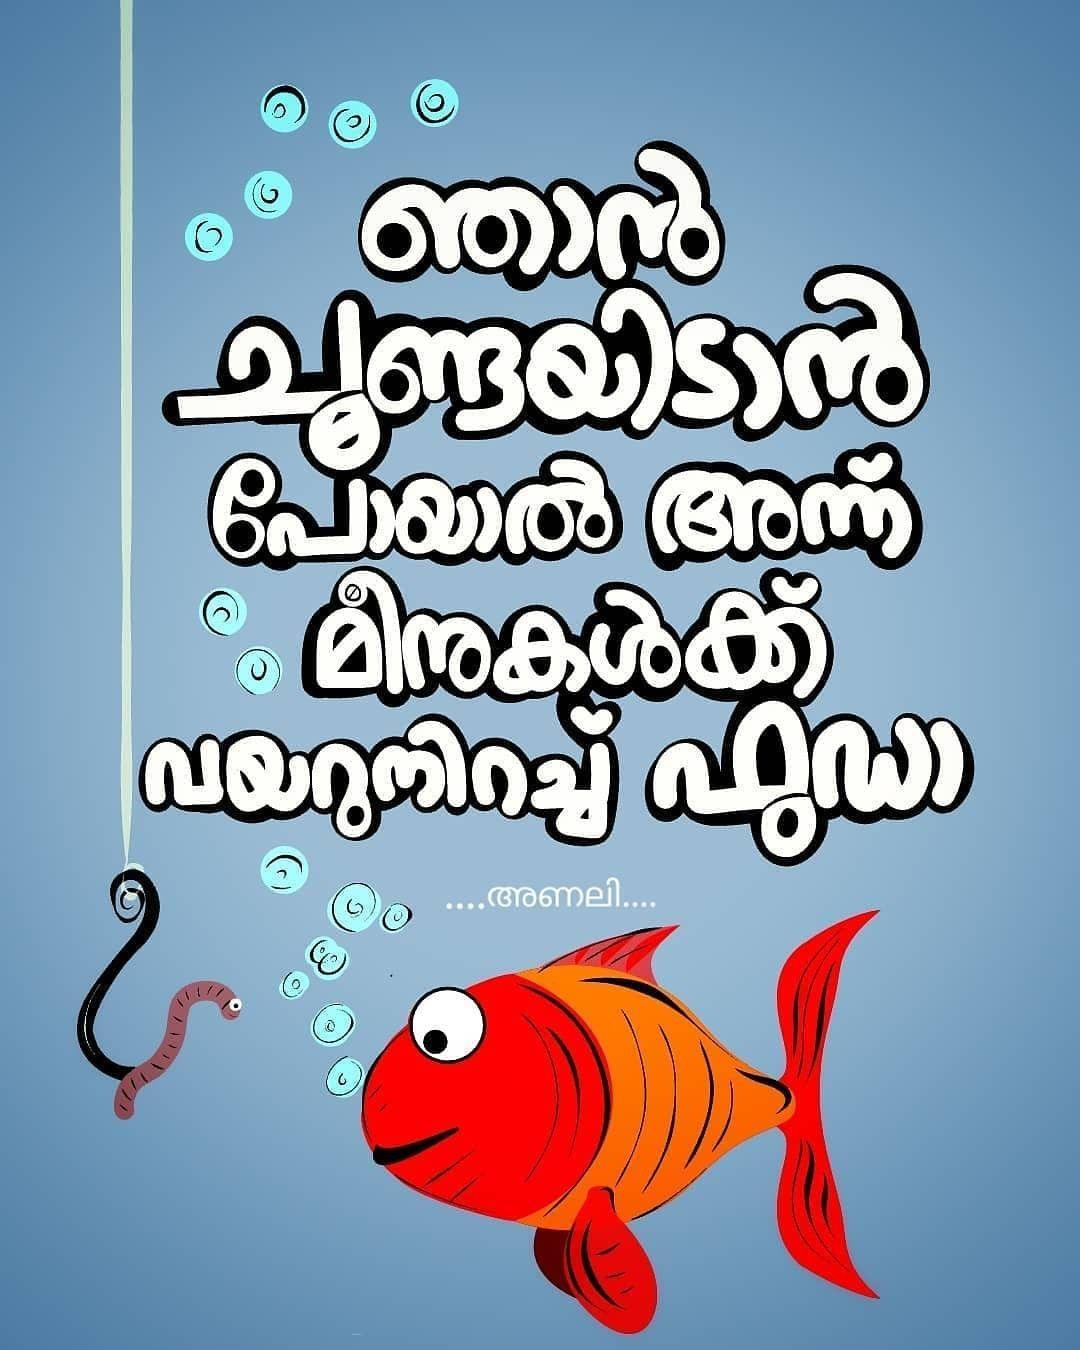 Ente Oru Karyam Funny Quotes Malayalam Quotes Status Quotes